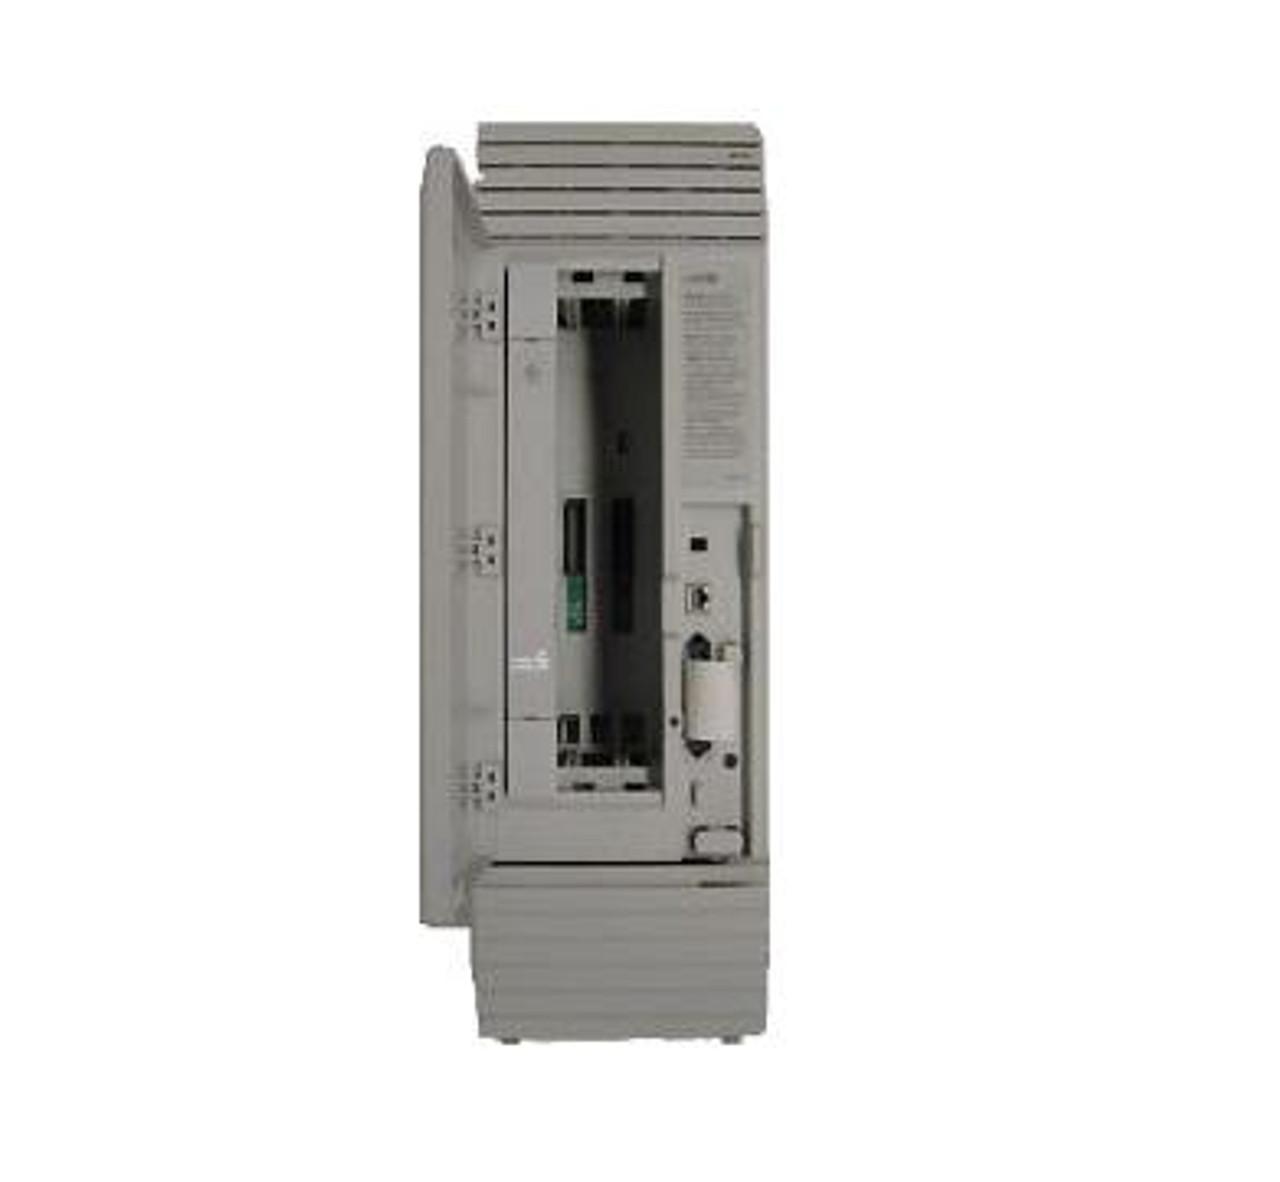 Refurbished Nortel Norstar Fiber Trunk Module 12x0